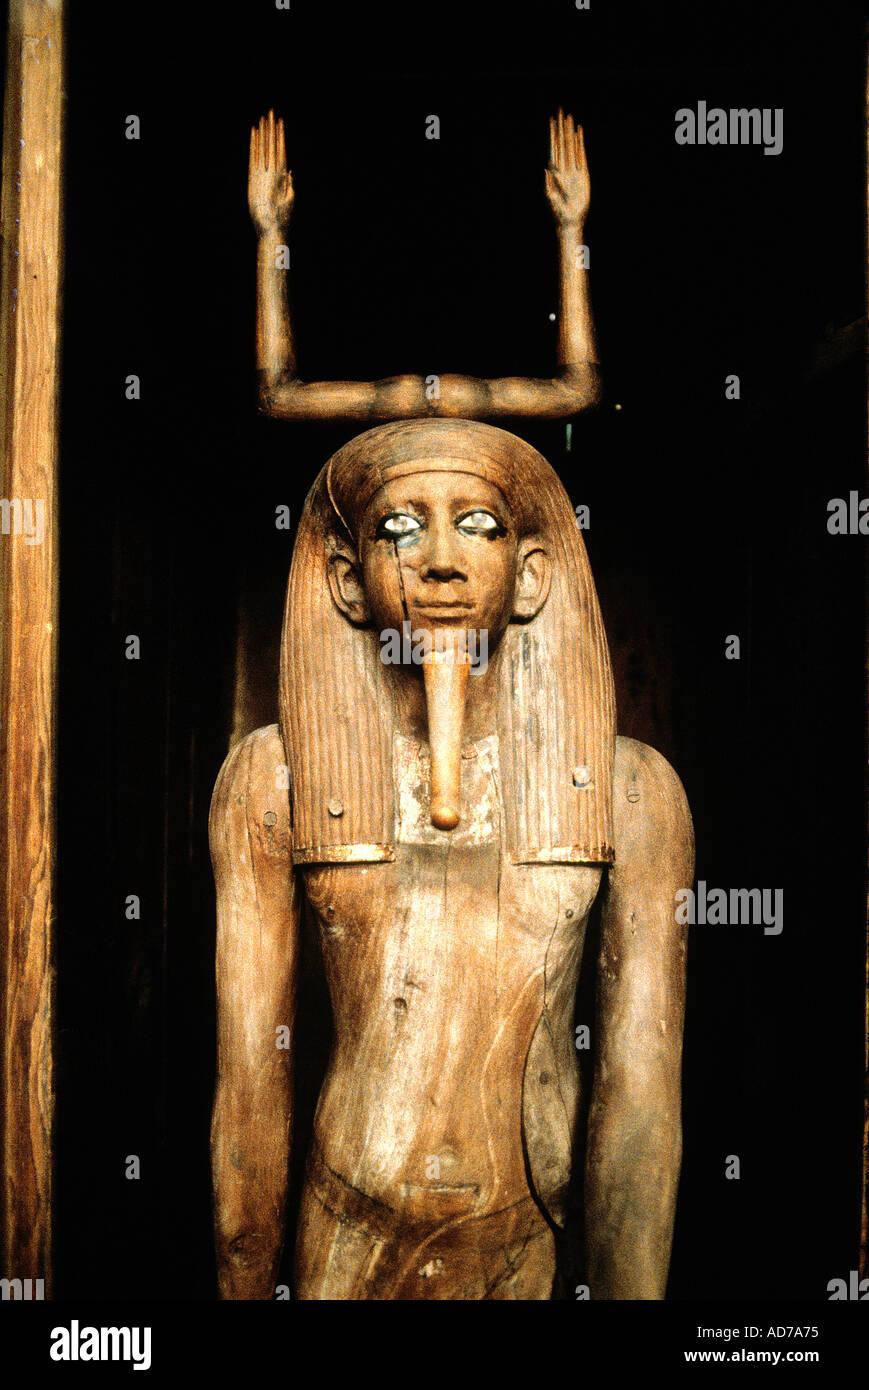 EGYPT CAIRO ANTIQUES MUSEUM PHARAOH TUT EN KAMON GRAVE ARTIFACTS WOODEN STATUE - Stock Image